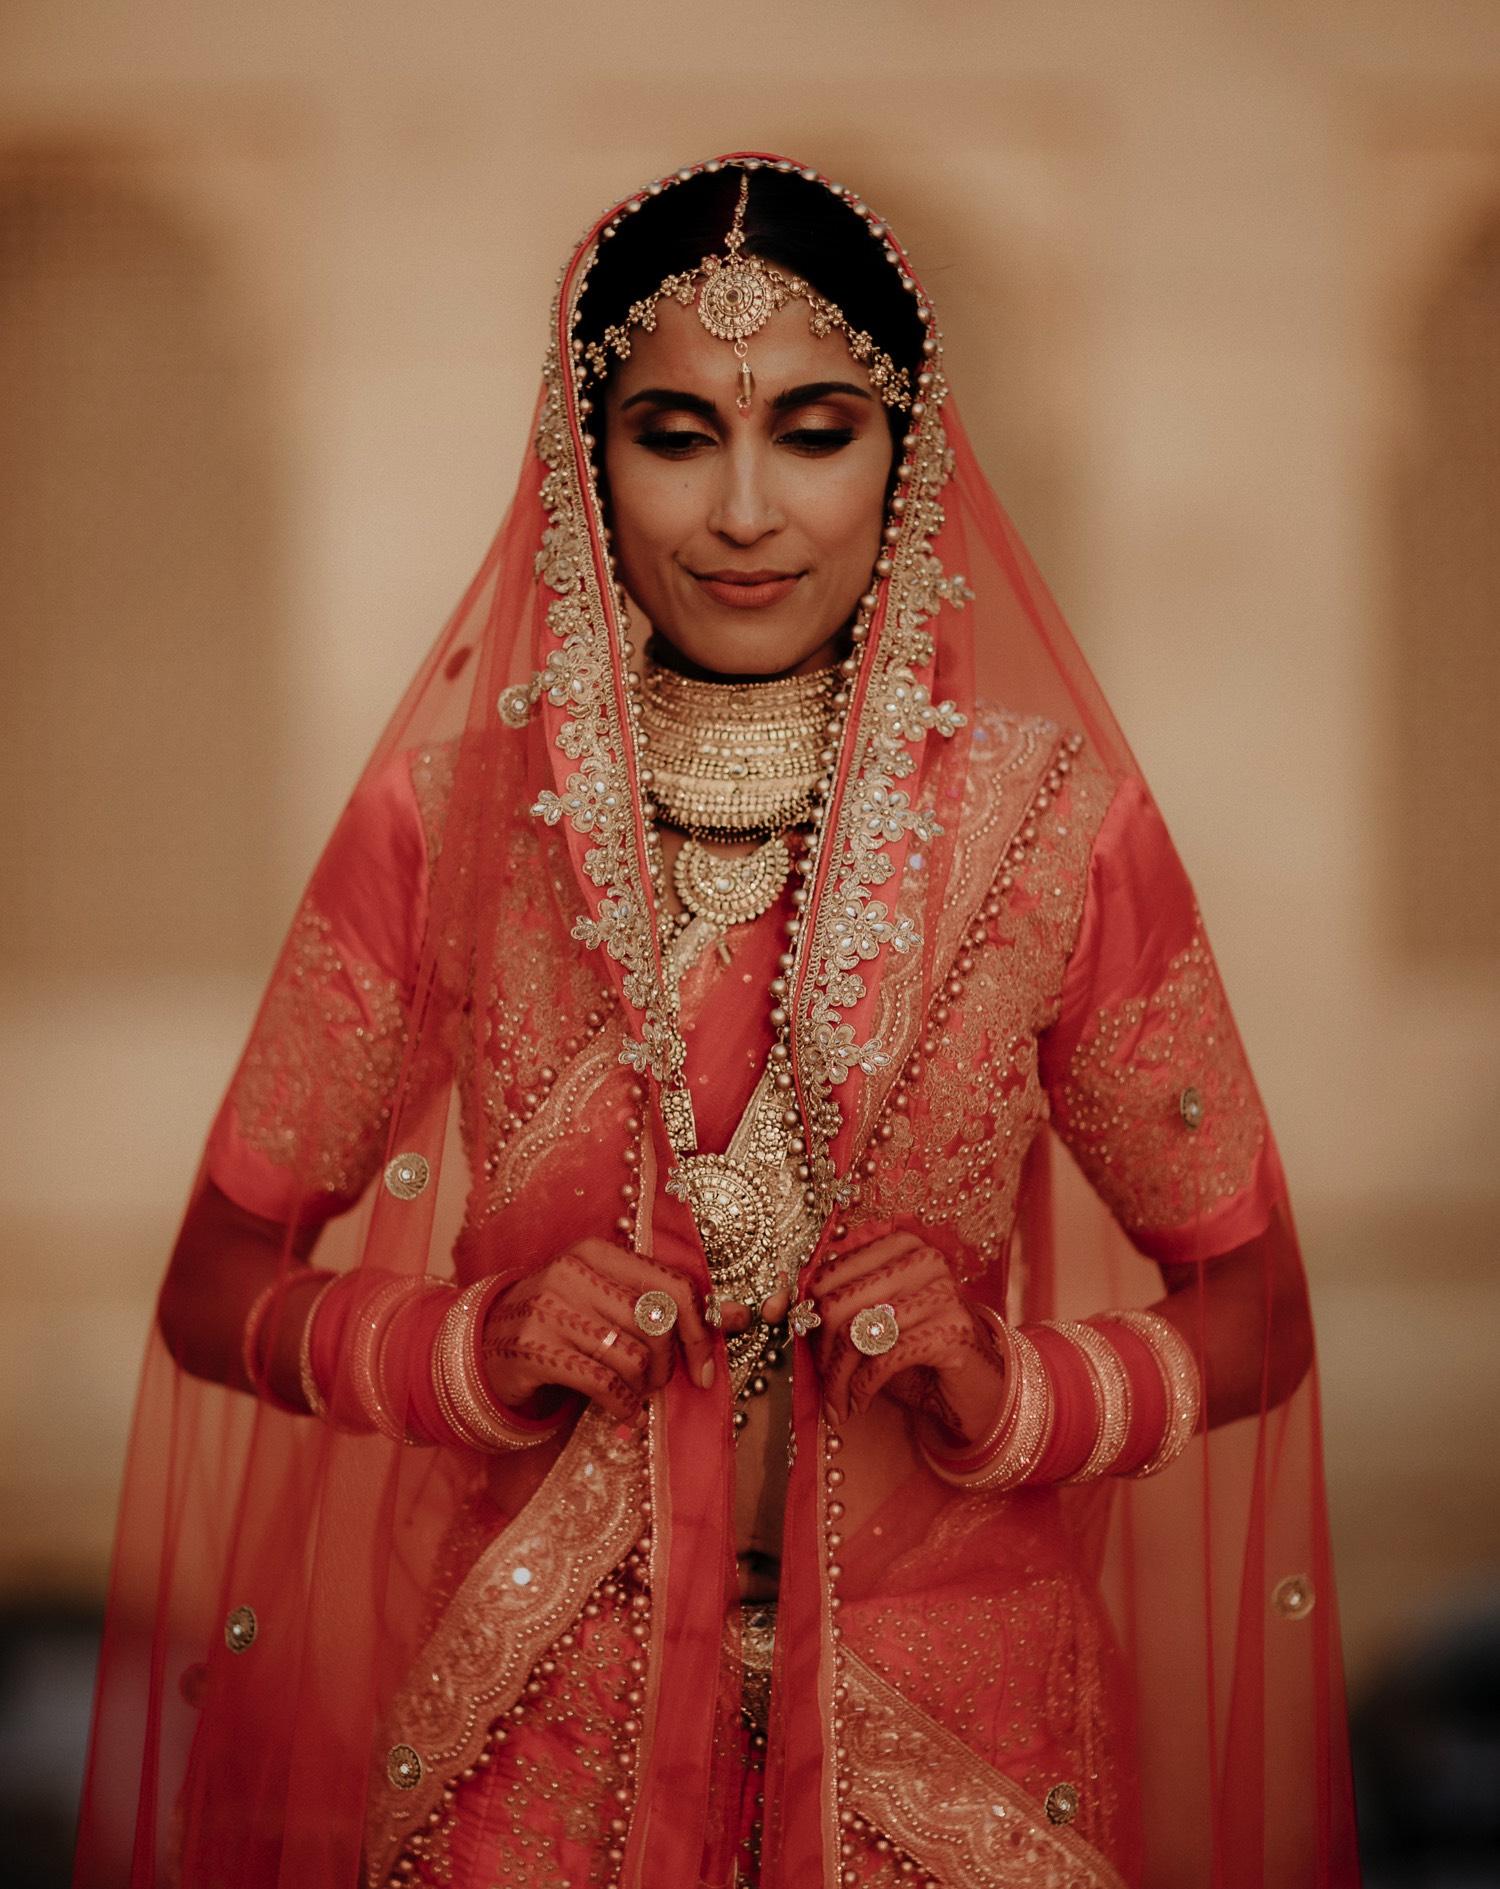 132-Jaisalmer-wedding-12693.jpg